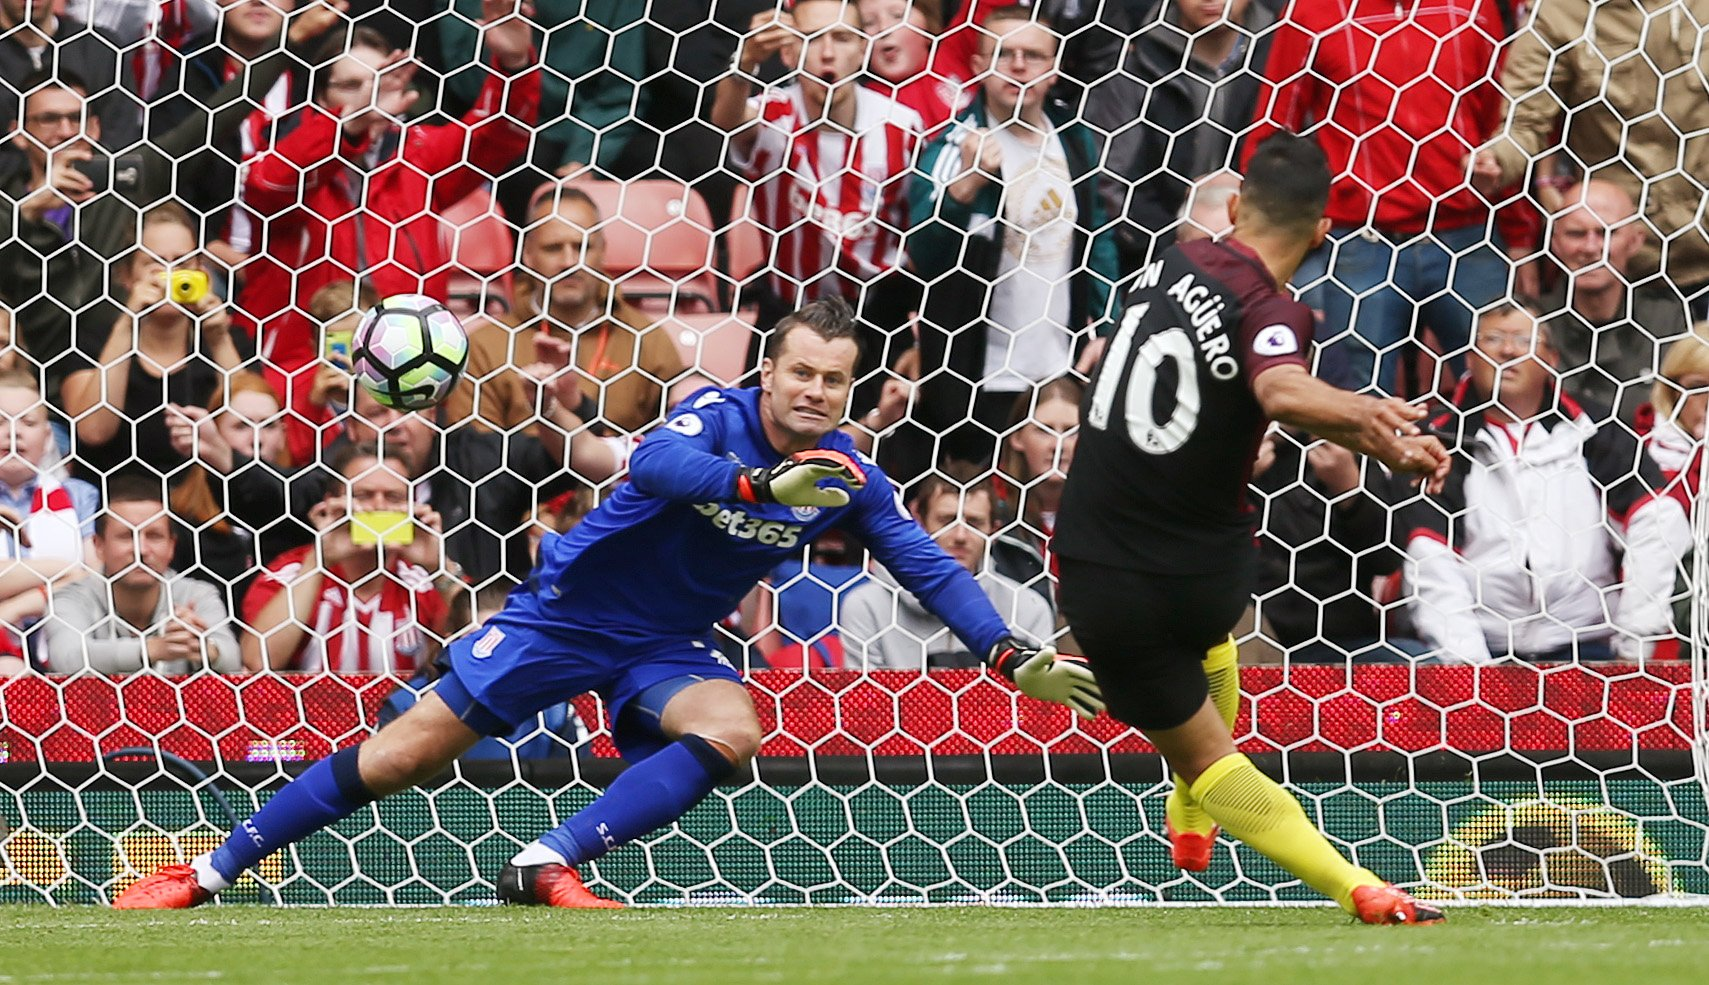 Iheanacho Shines, Aguero Bags Brace As Man City Outclass Stoke